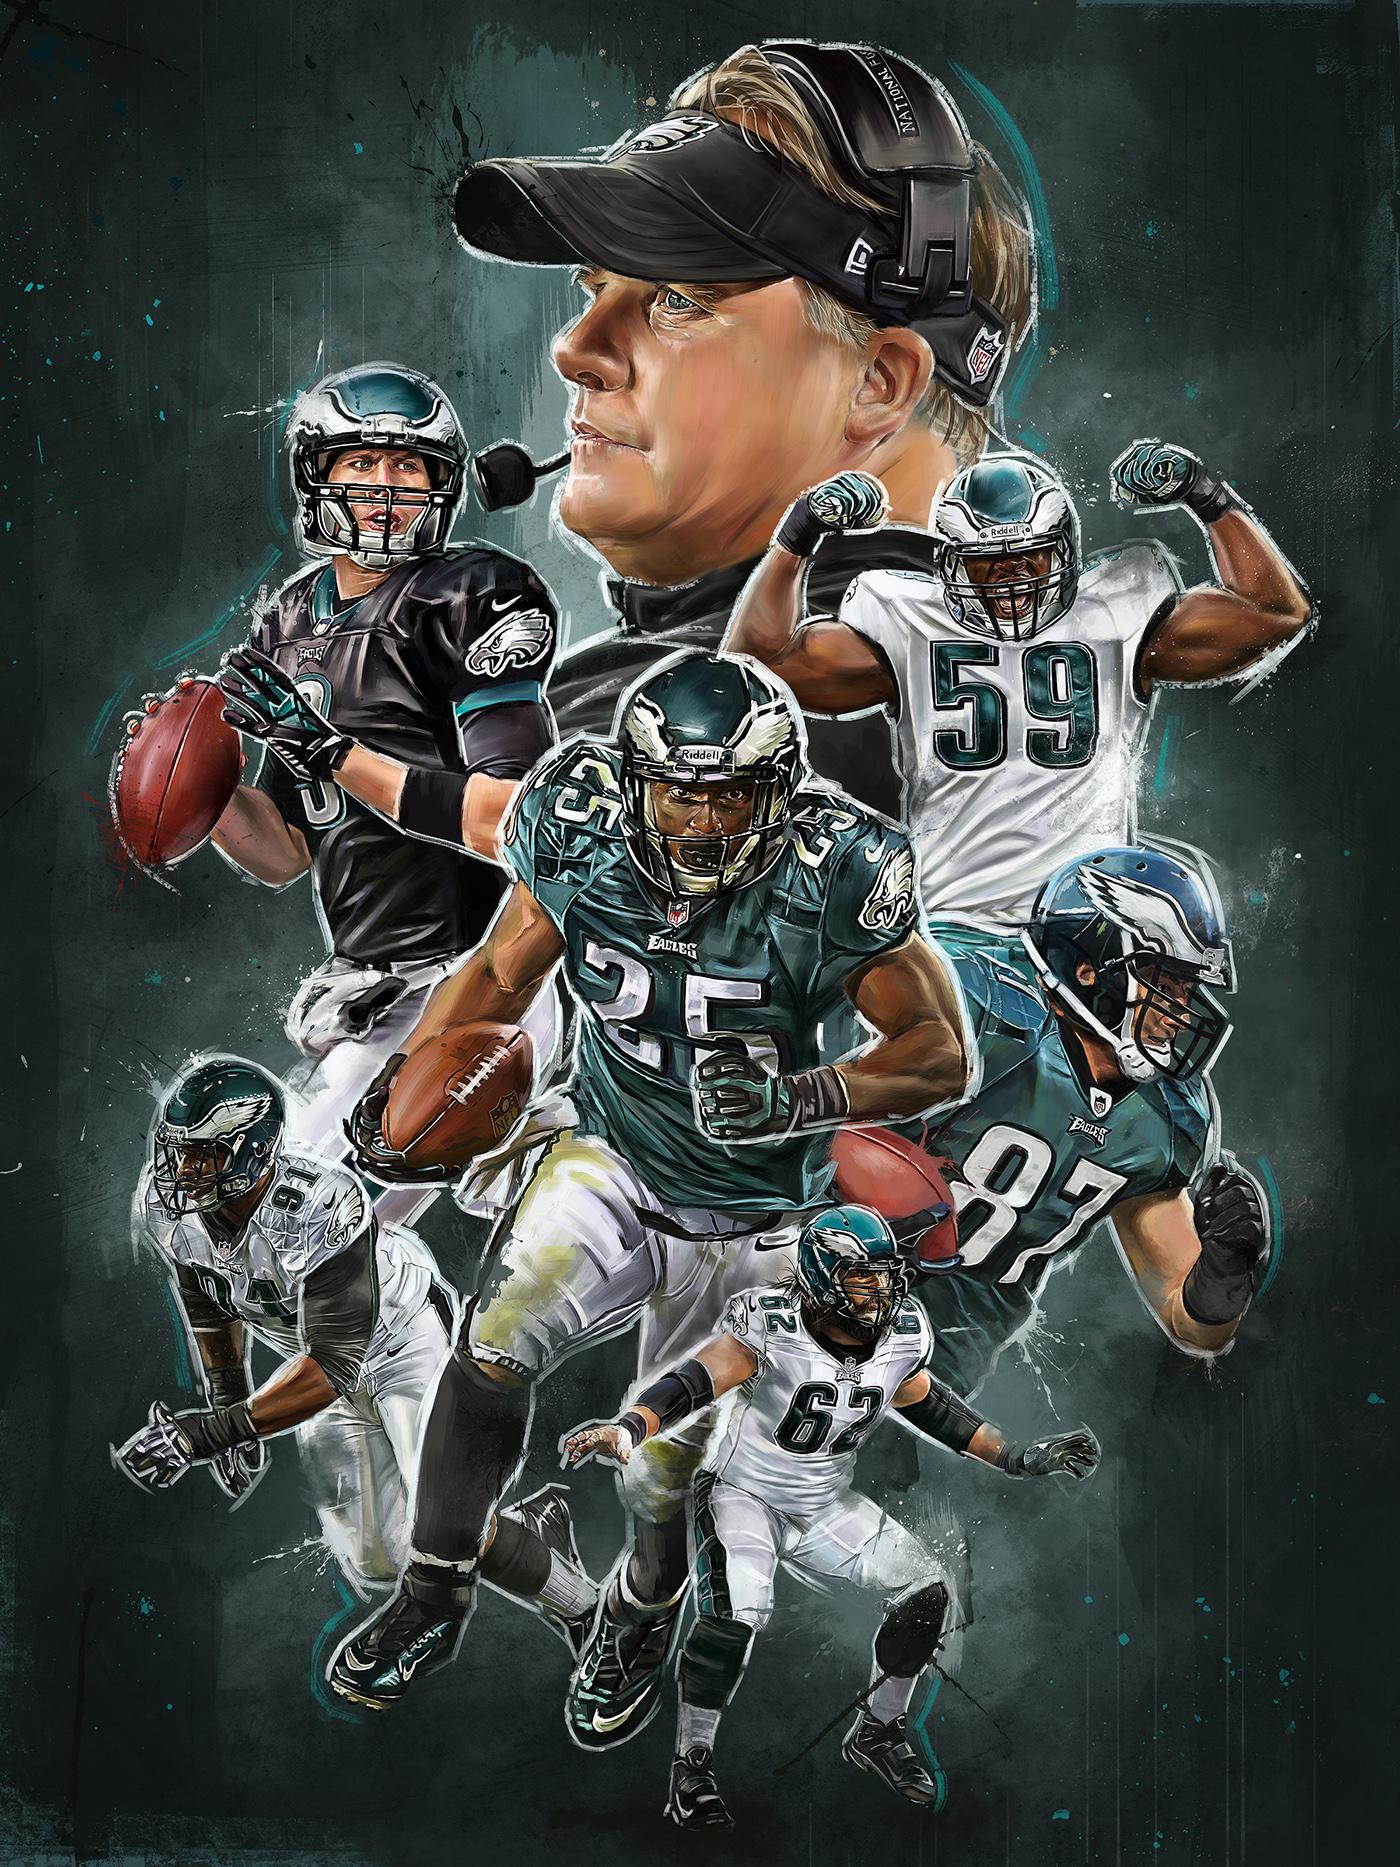 Philadelphia Eagles Wallpaper Hd Philadelphia Eagles 2014 Season Ticket Campaign On Behance